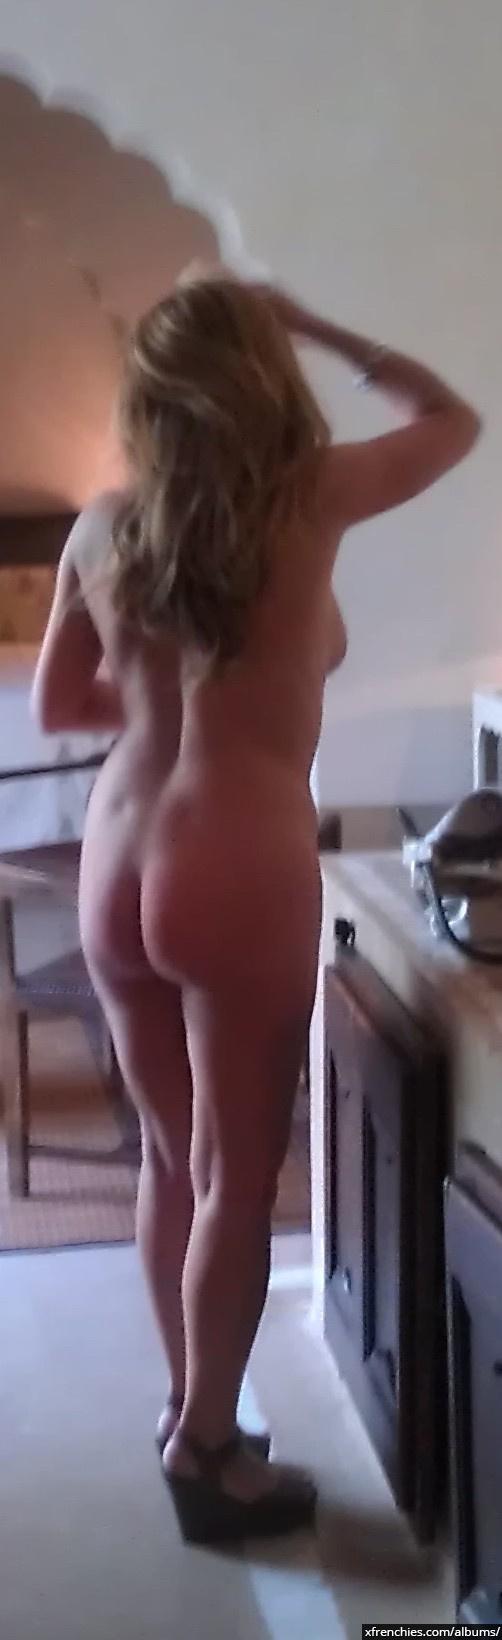 Photos de ma femme nue n°26